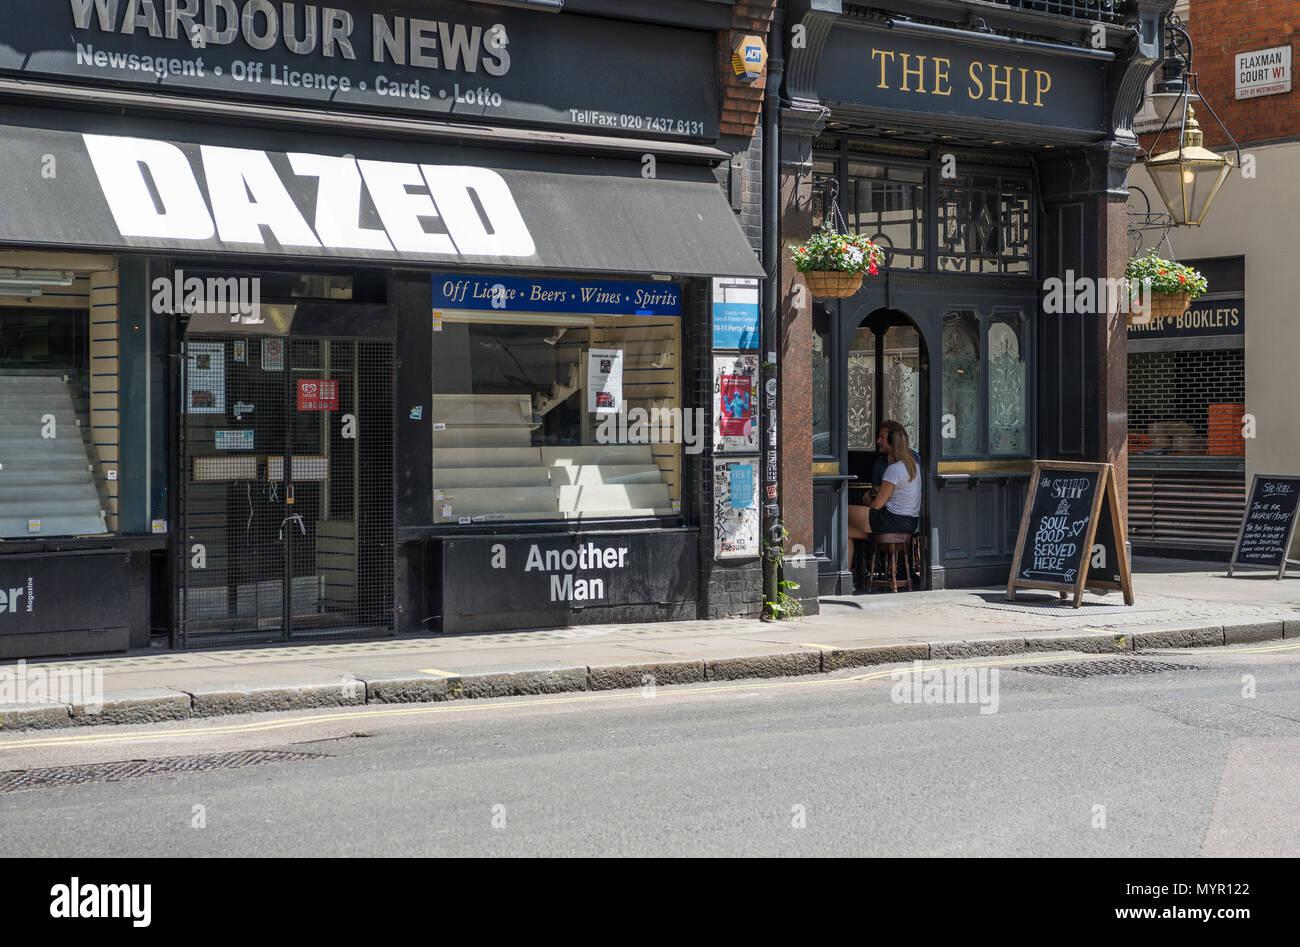 Wardour News newsagent shop and The Ship public house, Wardour Street, Soho, London, England, UK. - Stock Image